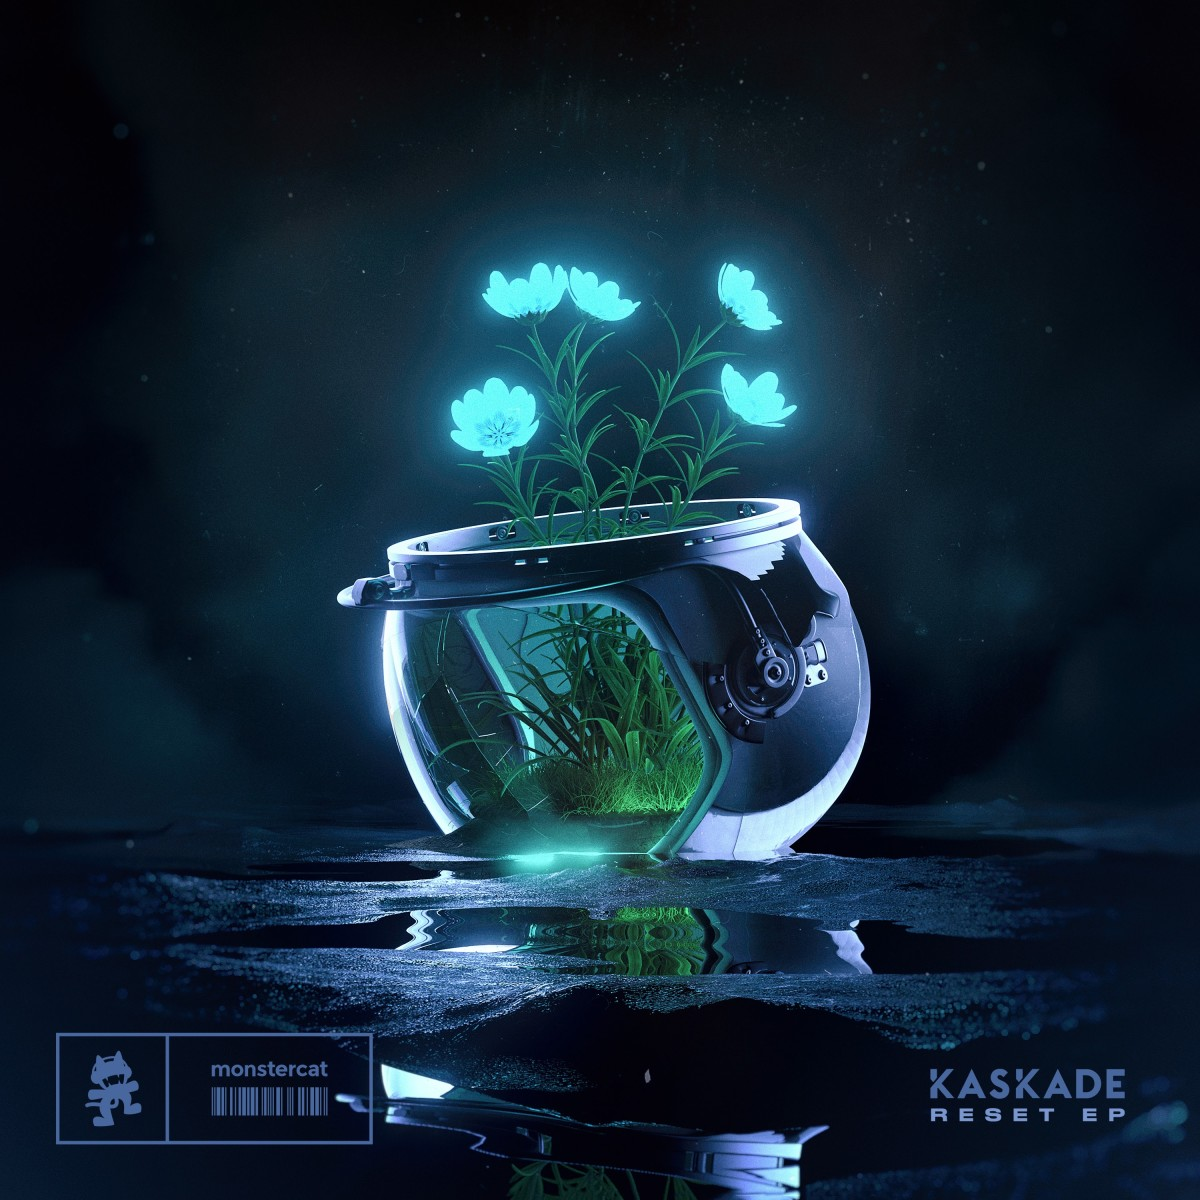 Kaskade - Reset EP (Art)